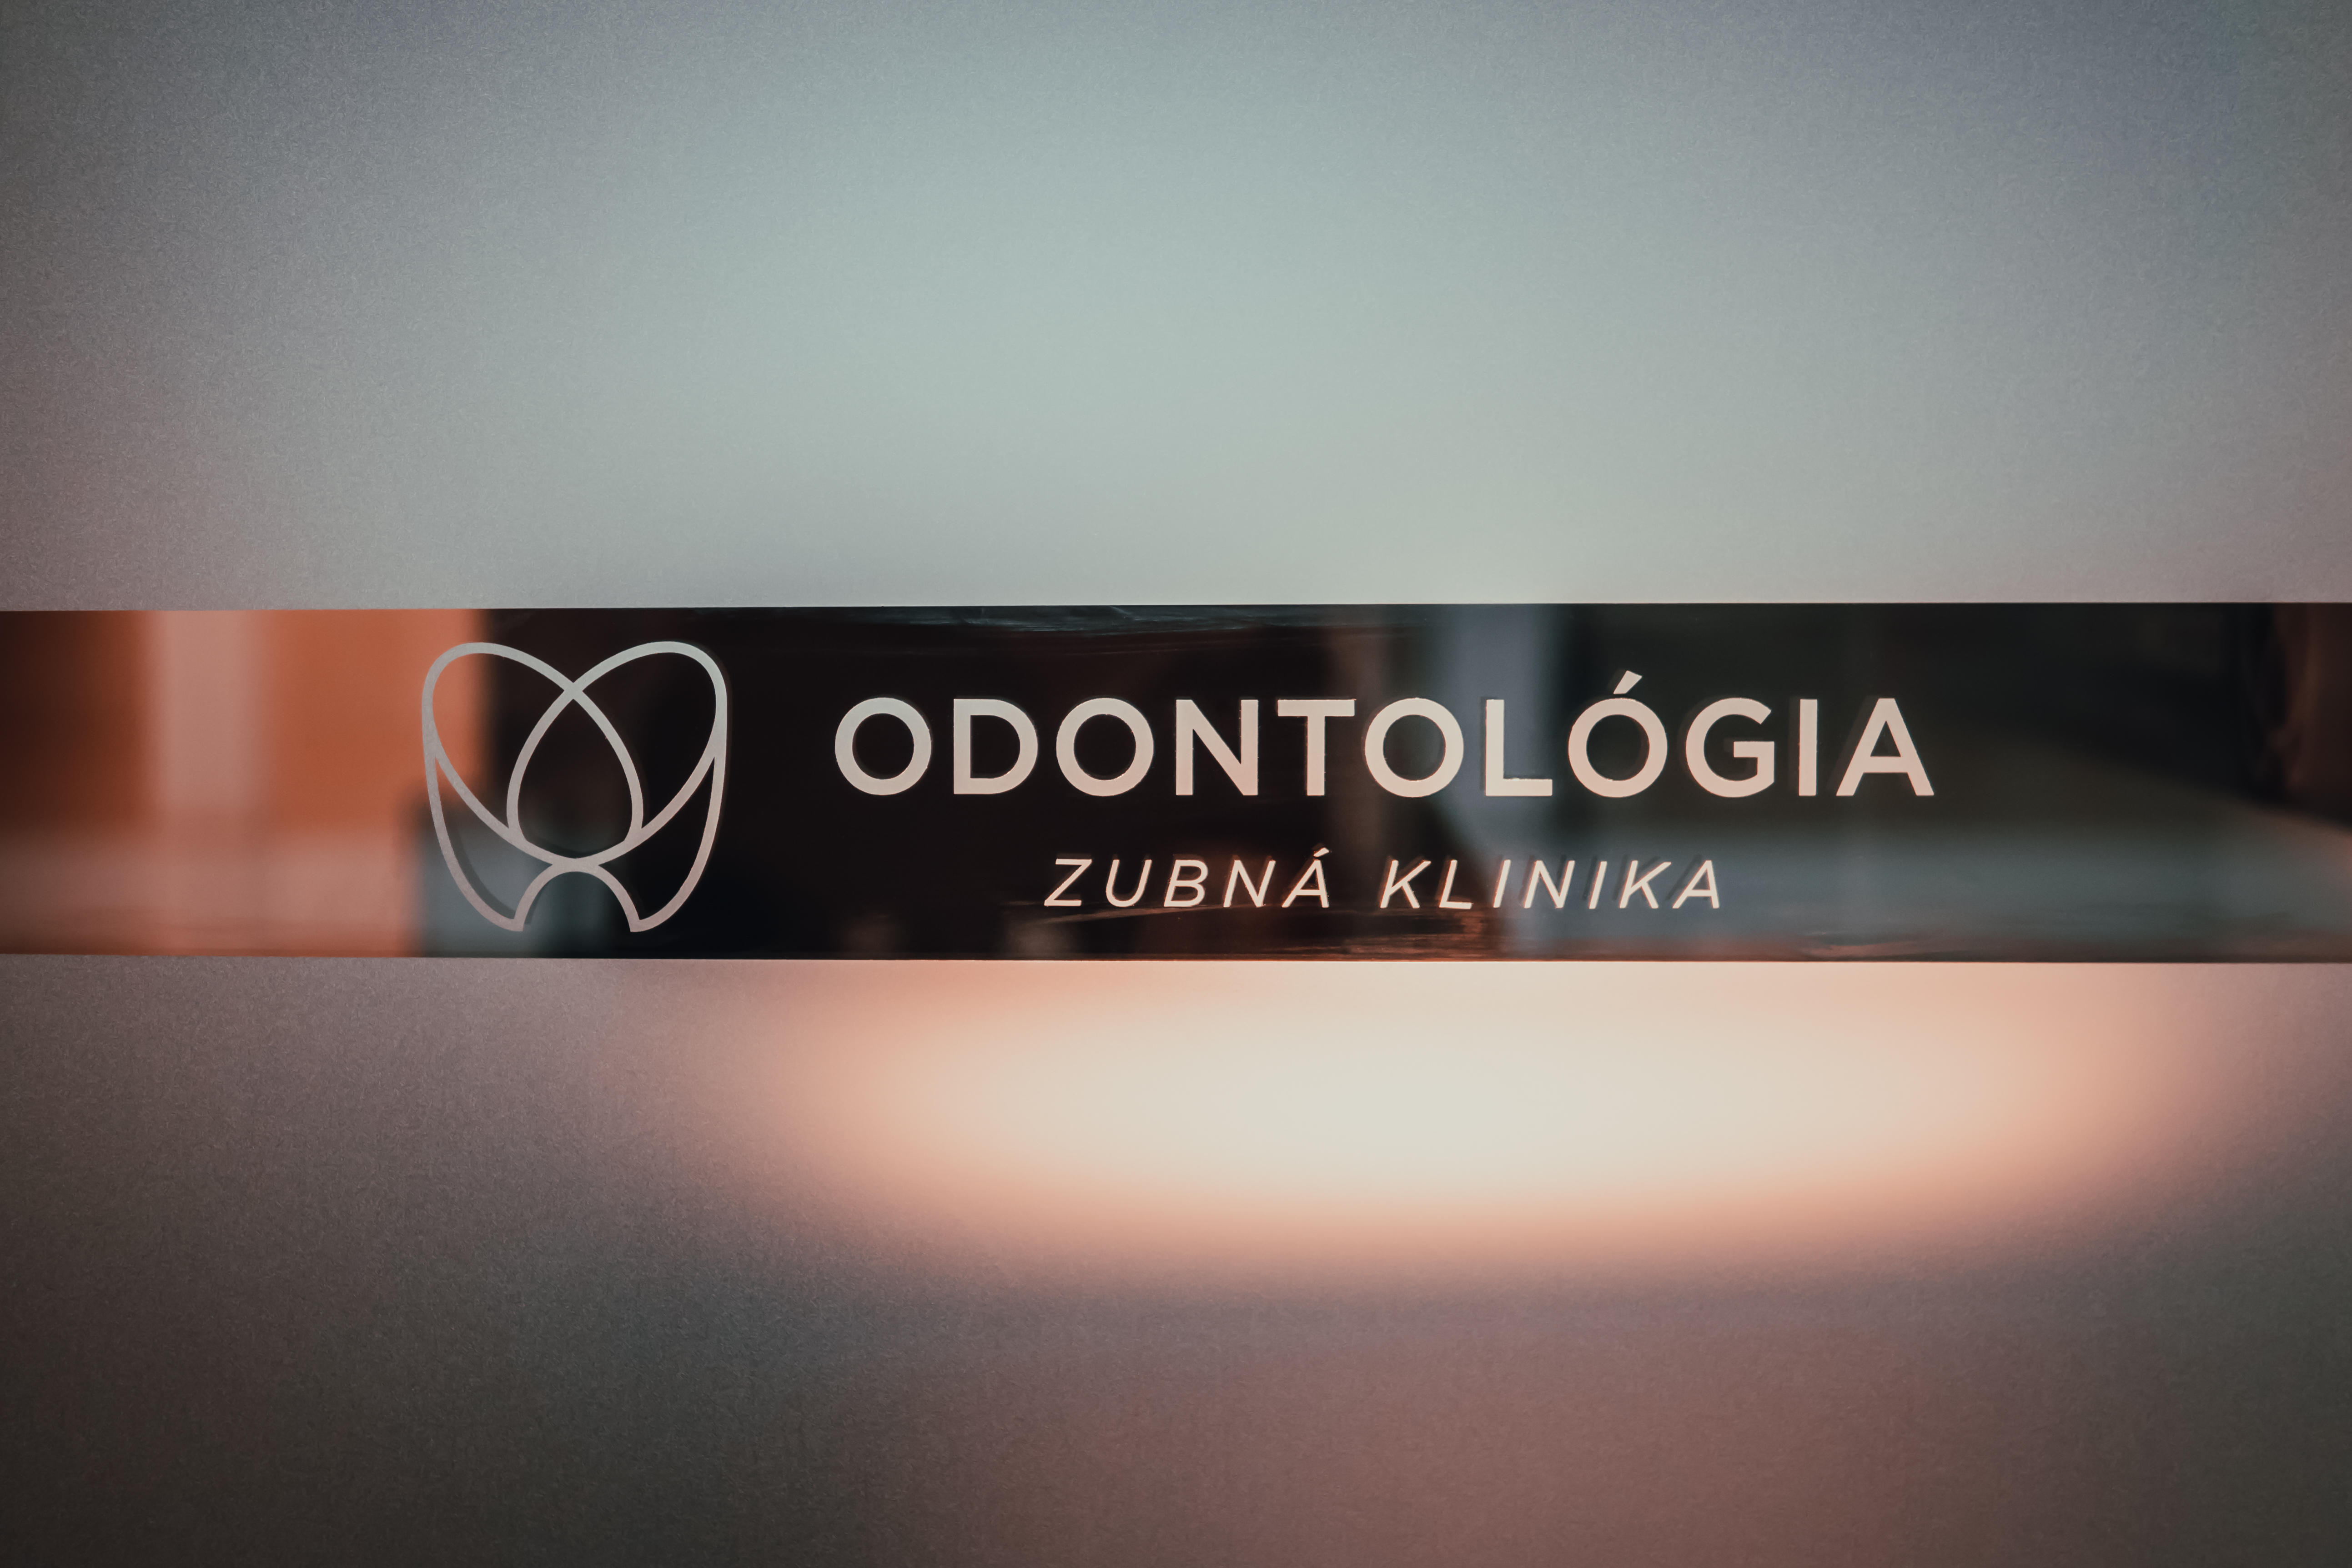 Odontologia, s.r.o.